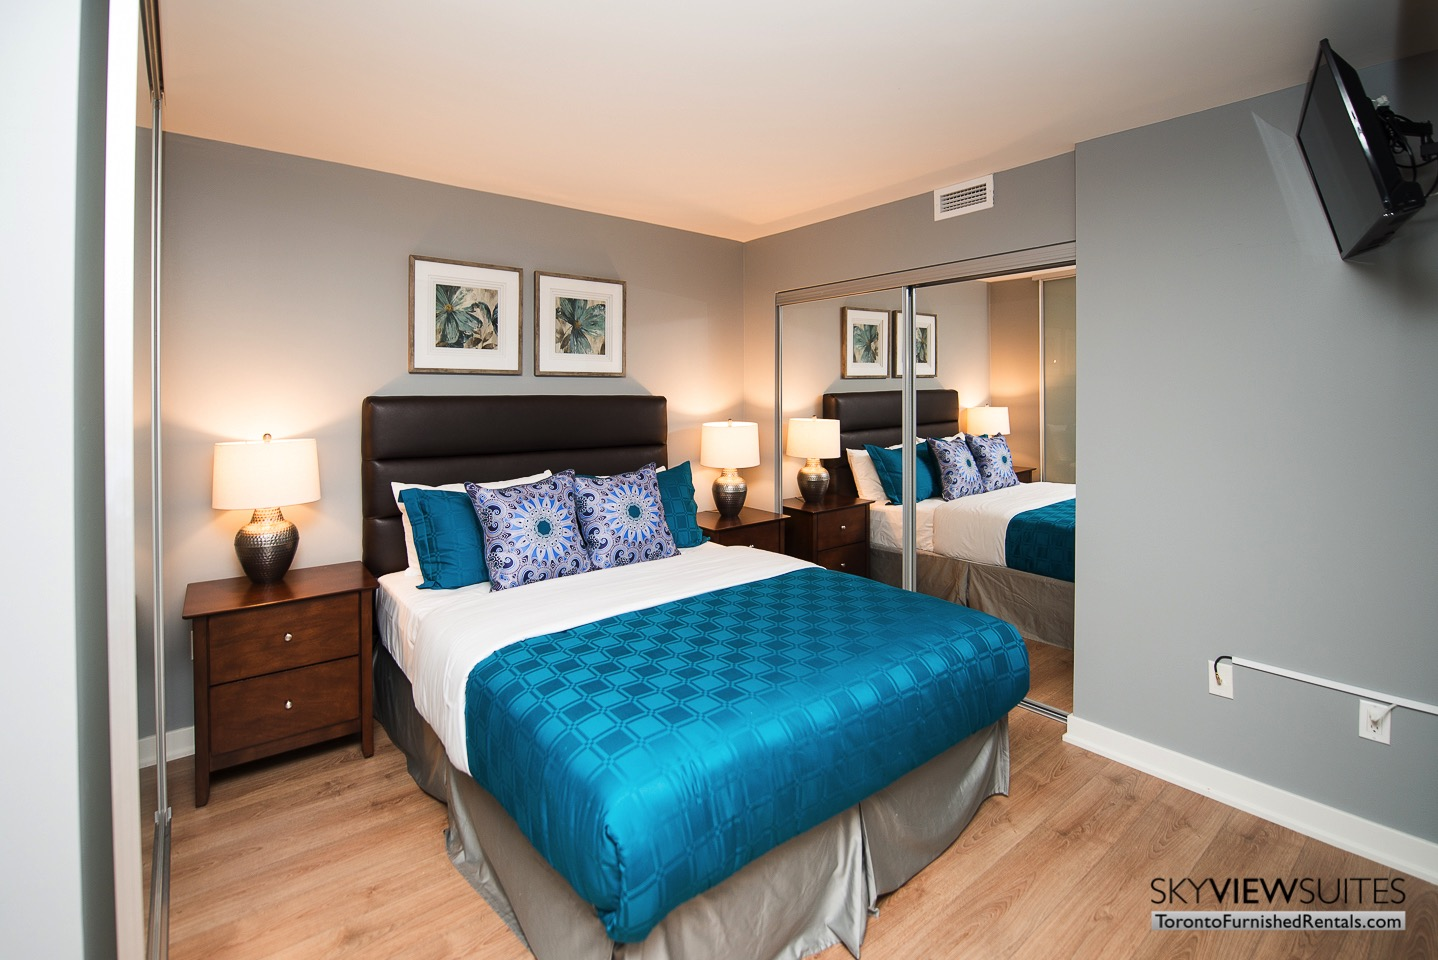 urnished-apartments-bedroom-King-west